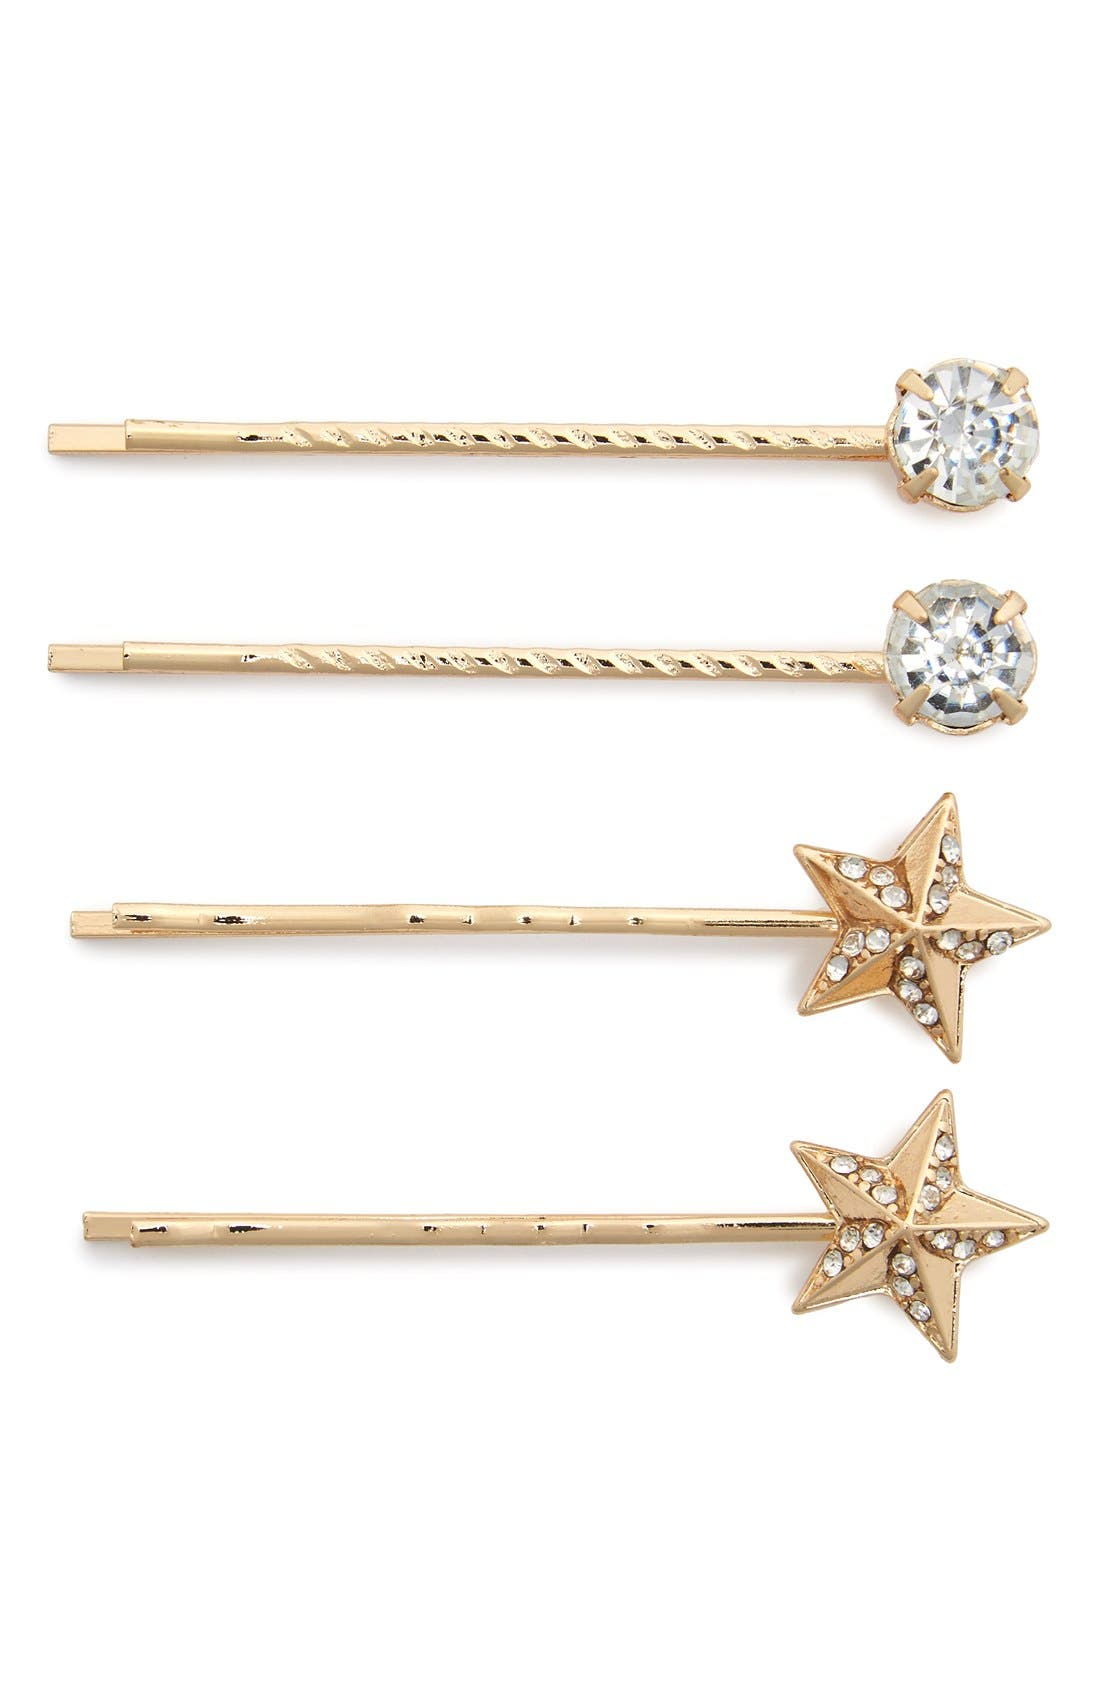 Main Image - Tasha 'Shooting Star' Bobby Pins (4-Pack)